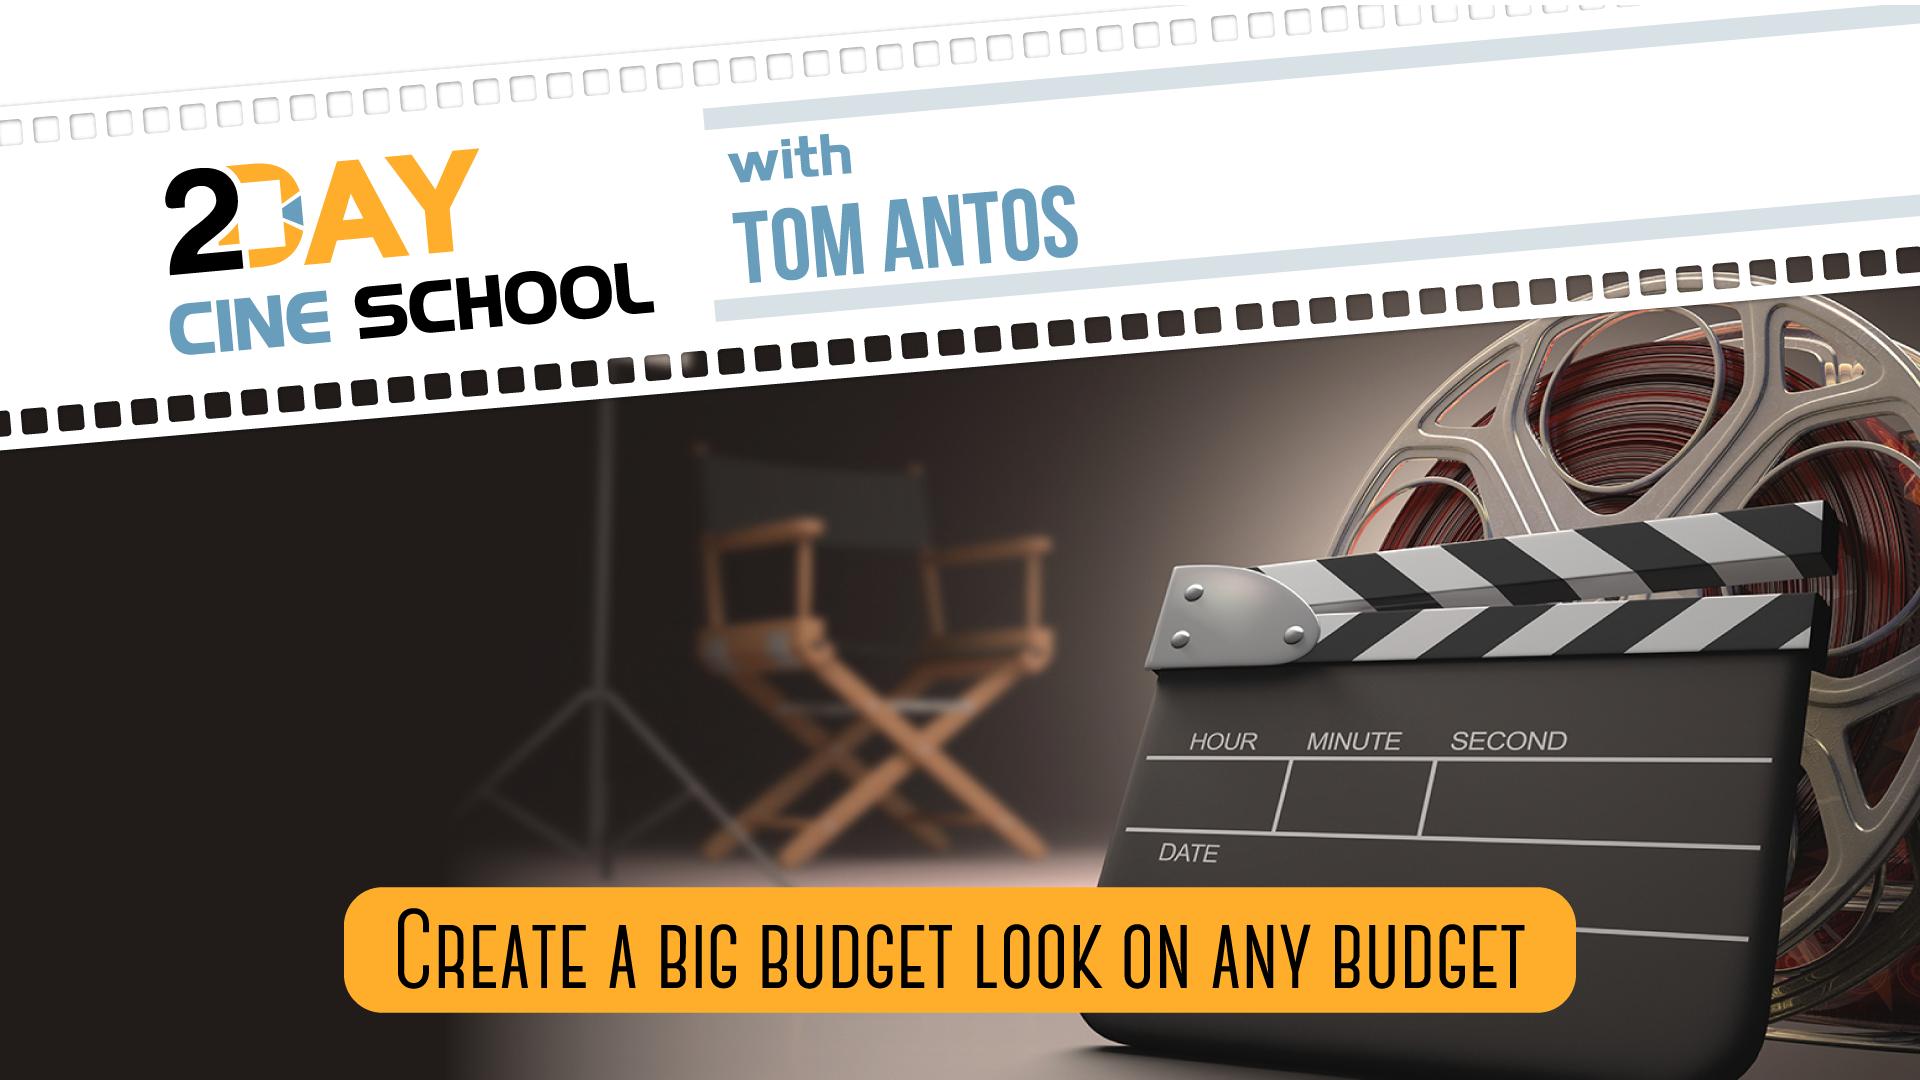 2-Day Cine School with Tom Antos - Workshop Video